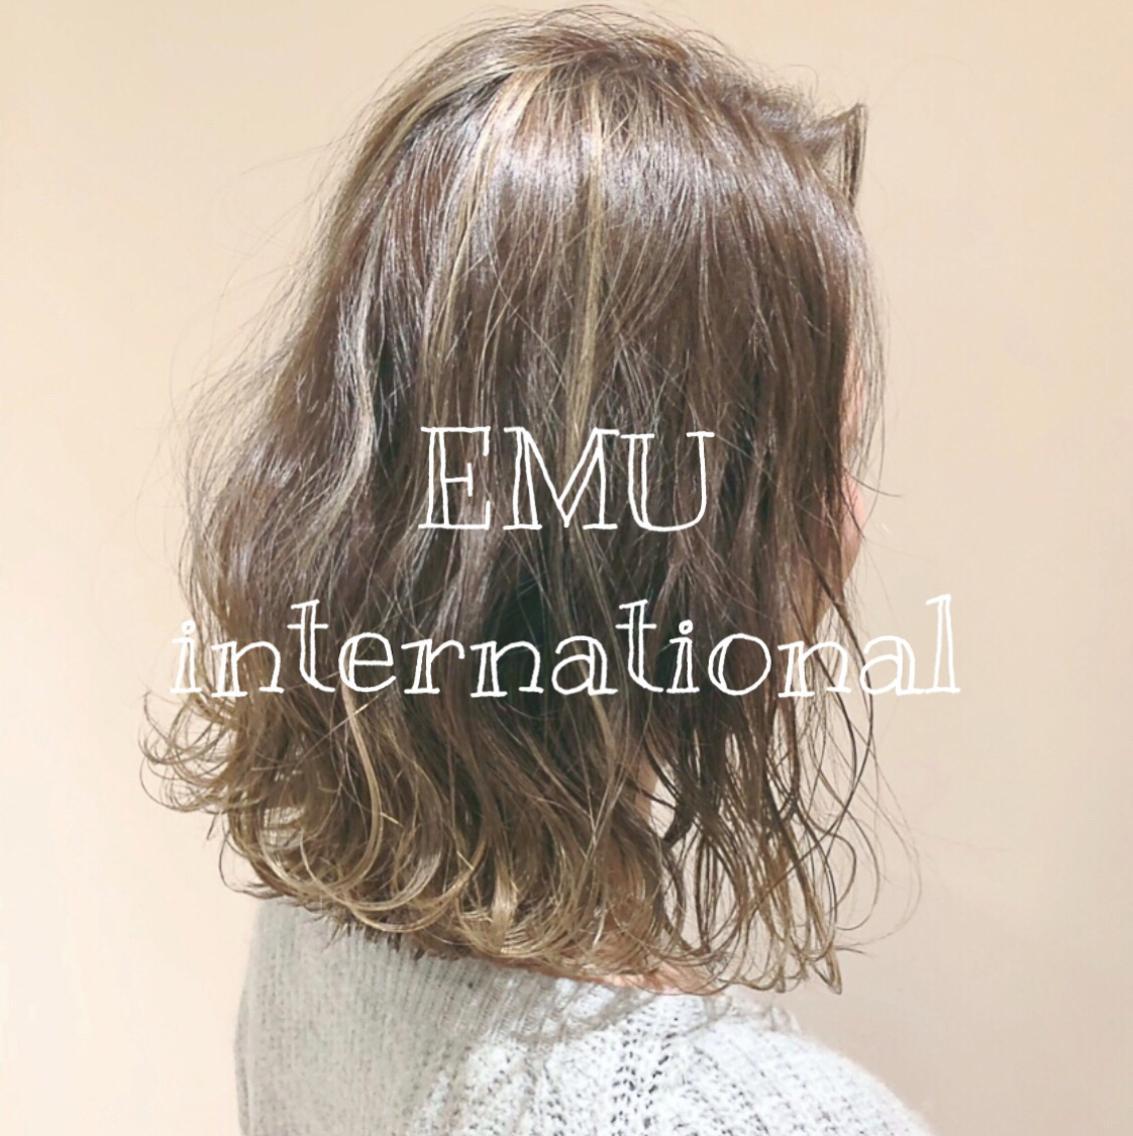 EMUinternational所属・常角友野の掲載